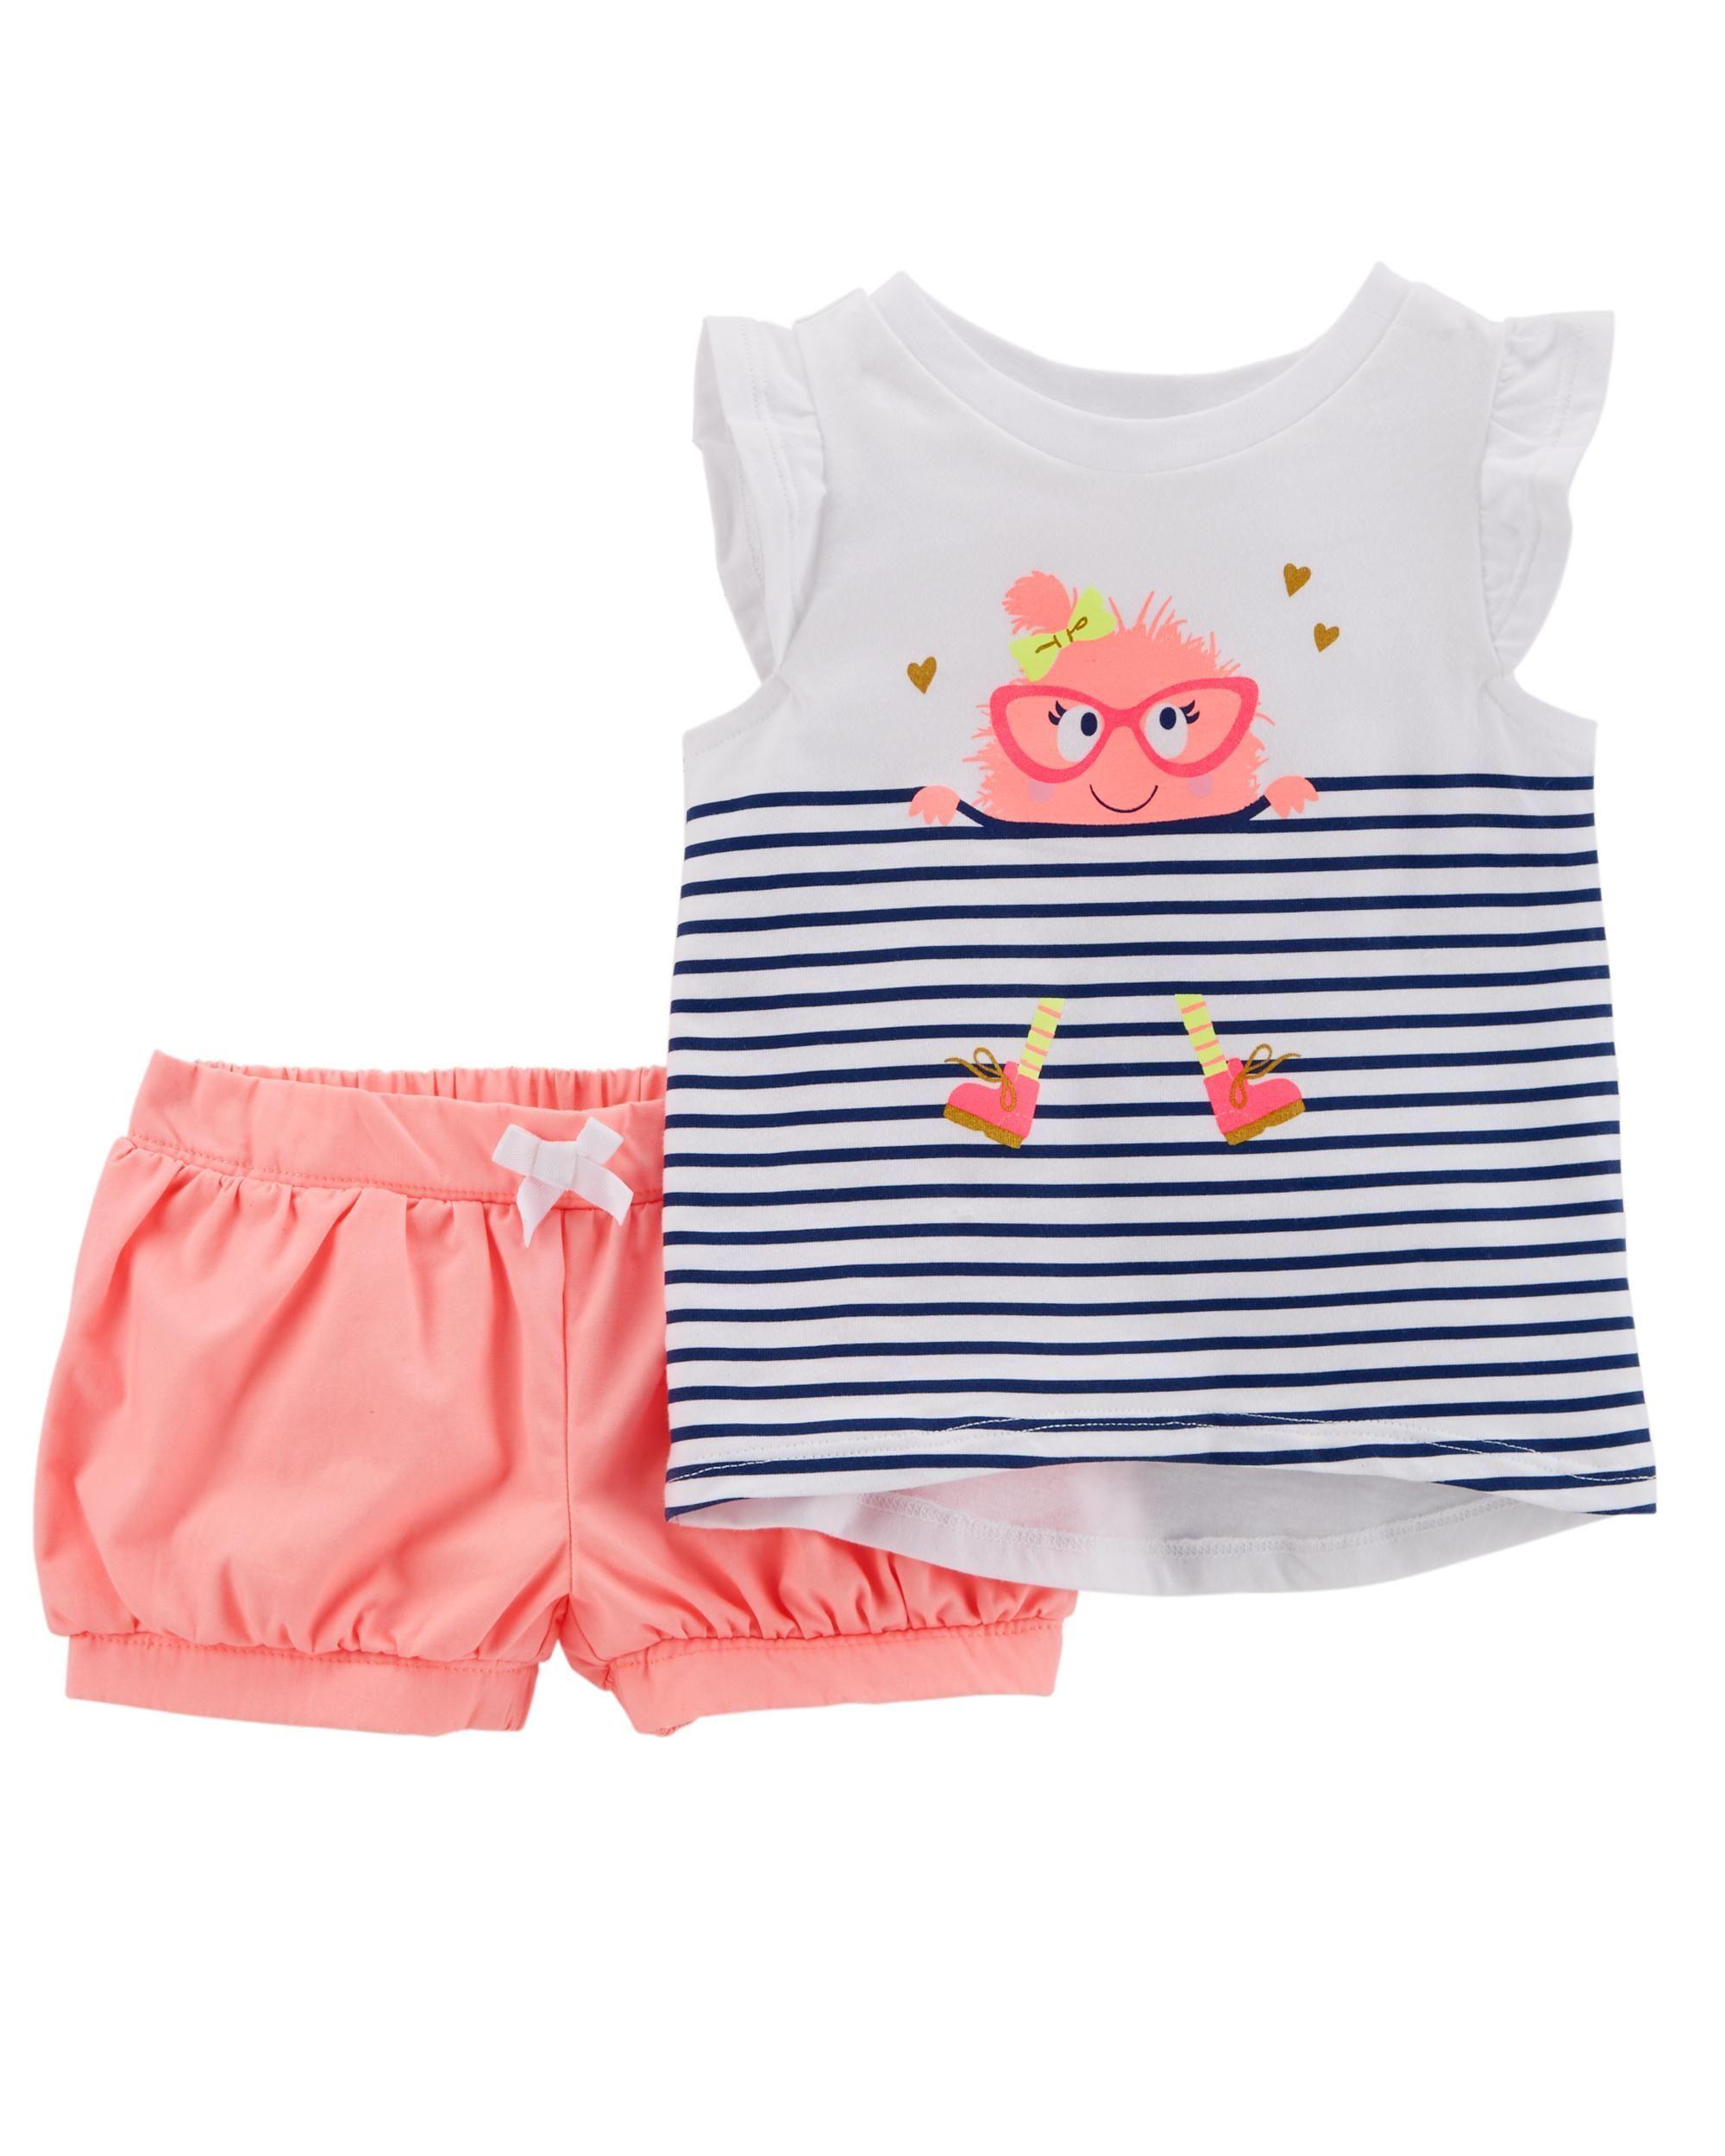 0351b4d89 2-Piece Monster Hi-Lo Top & Neon Short Set | Little girl fashion ...